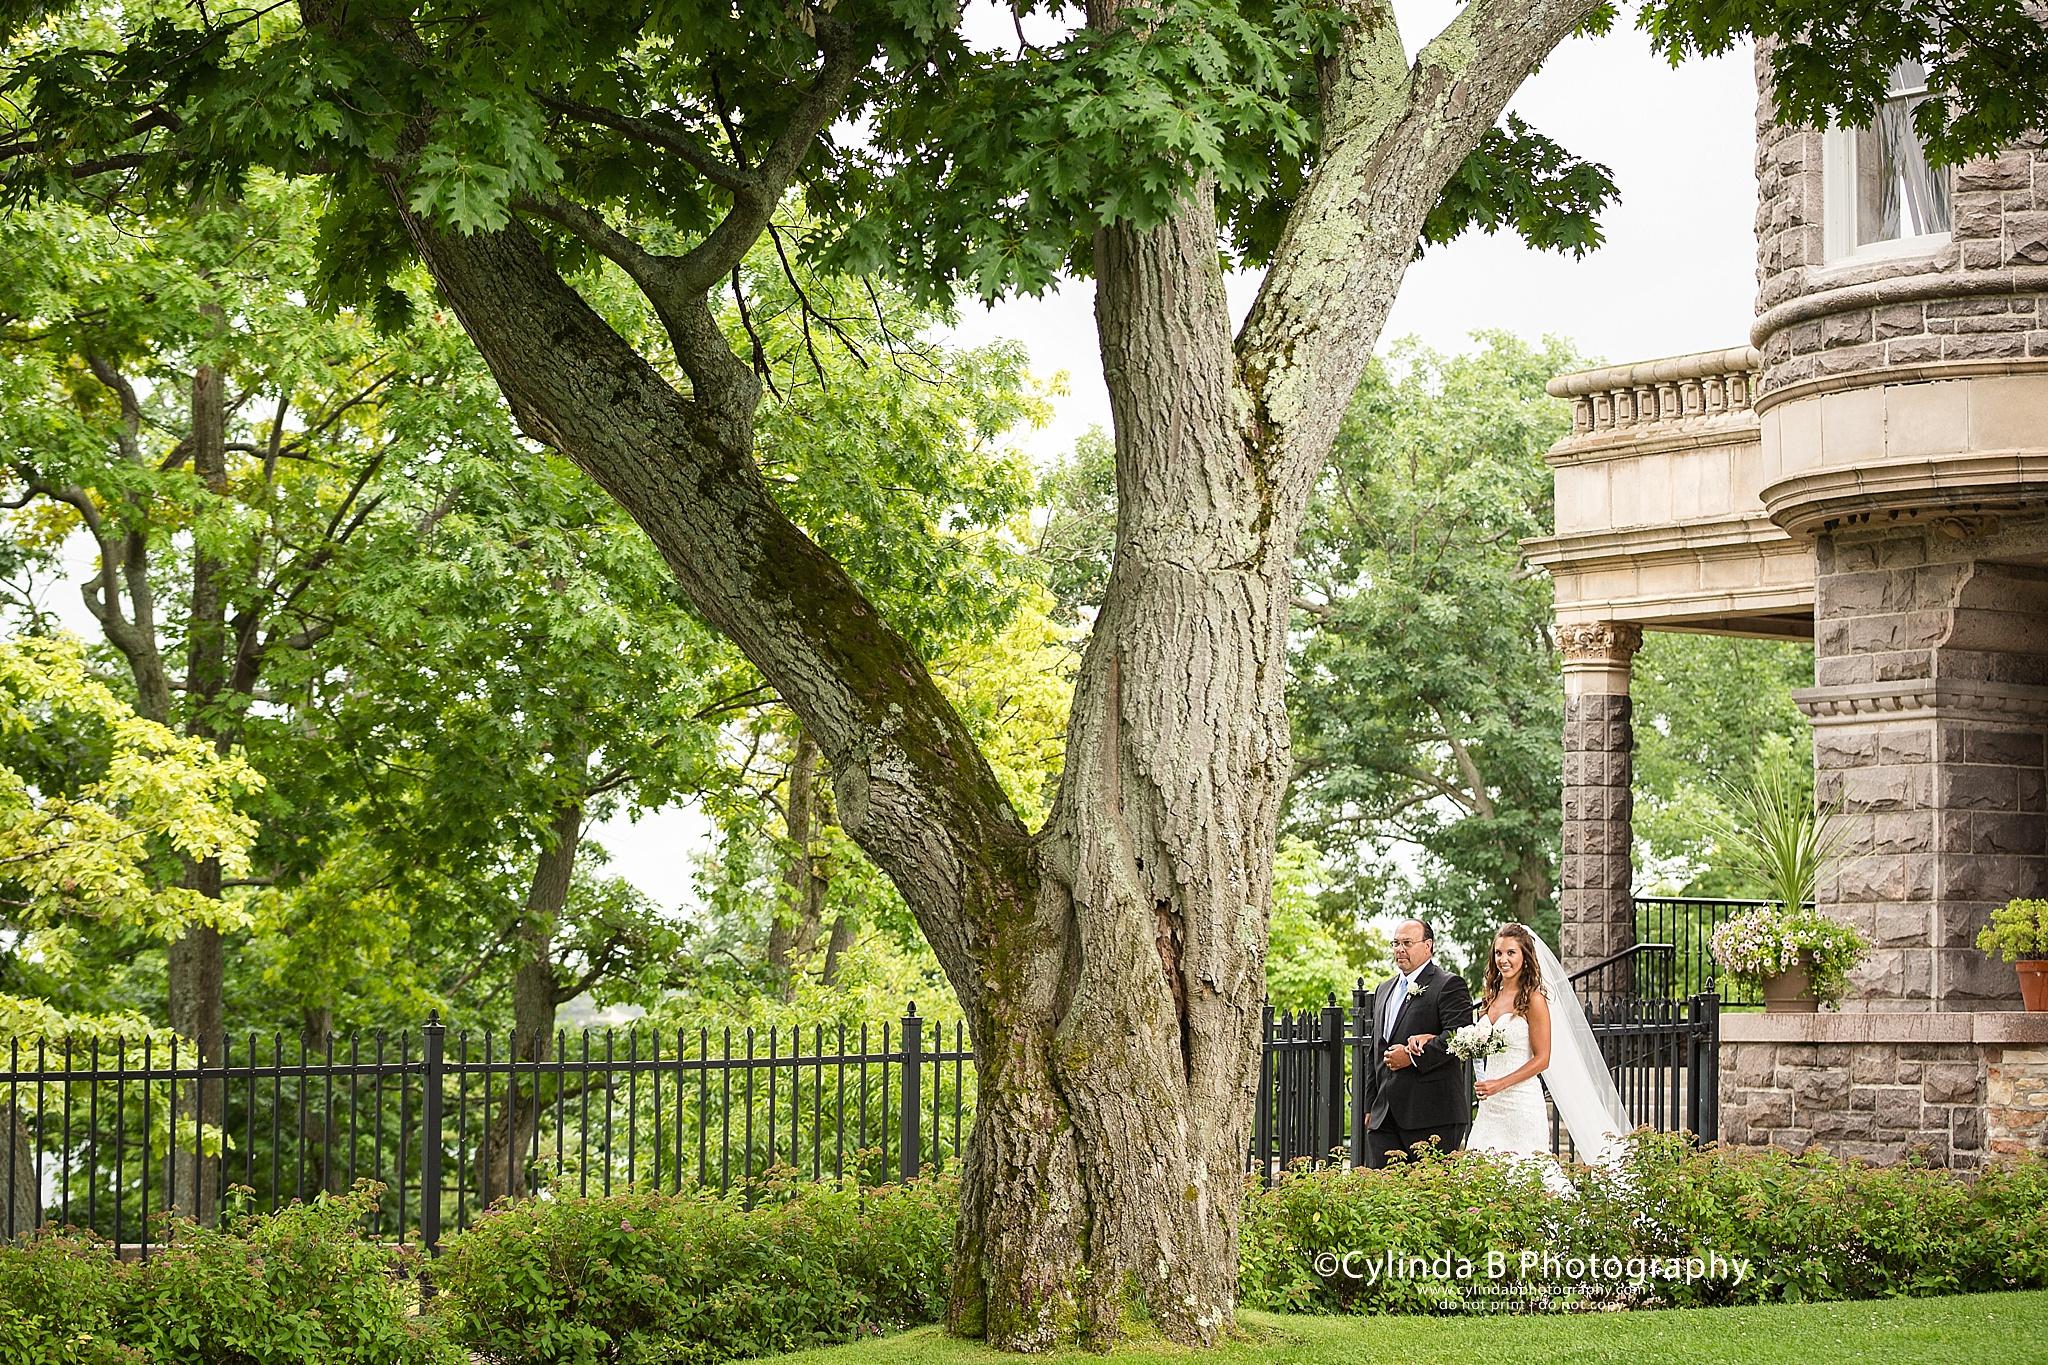 Boldt Castle Wedding, Alexandria Bay, Wedding, Photograper, Cylinda B Photography-18